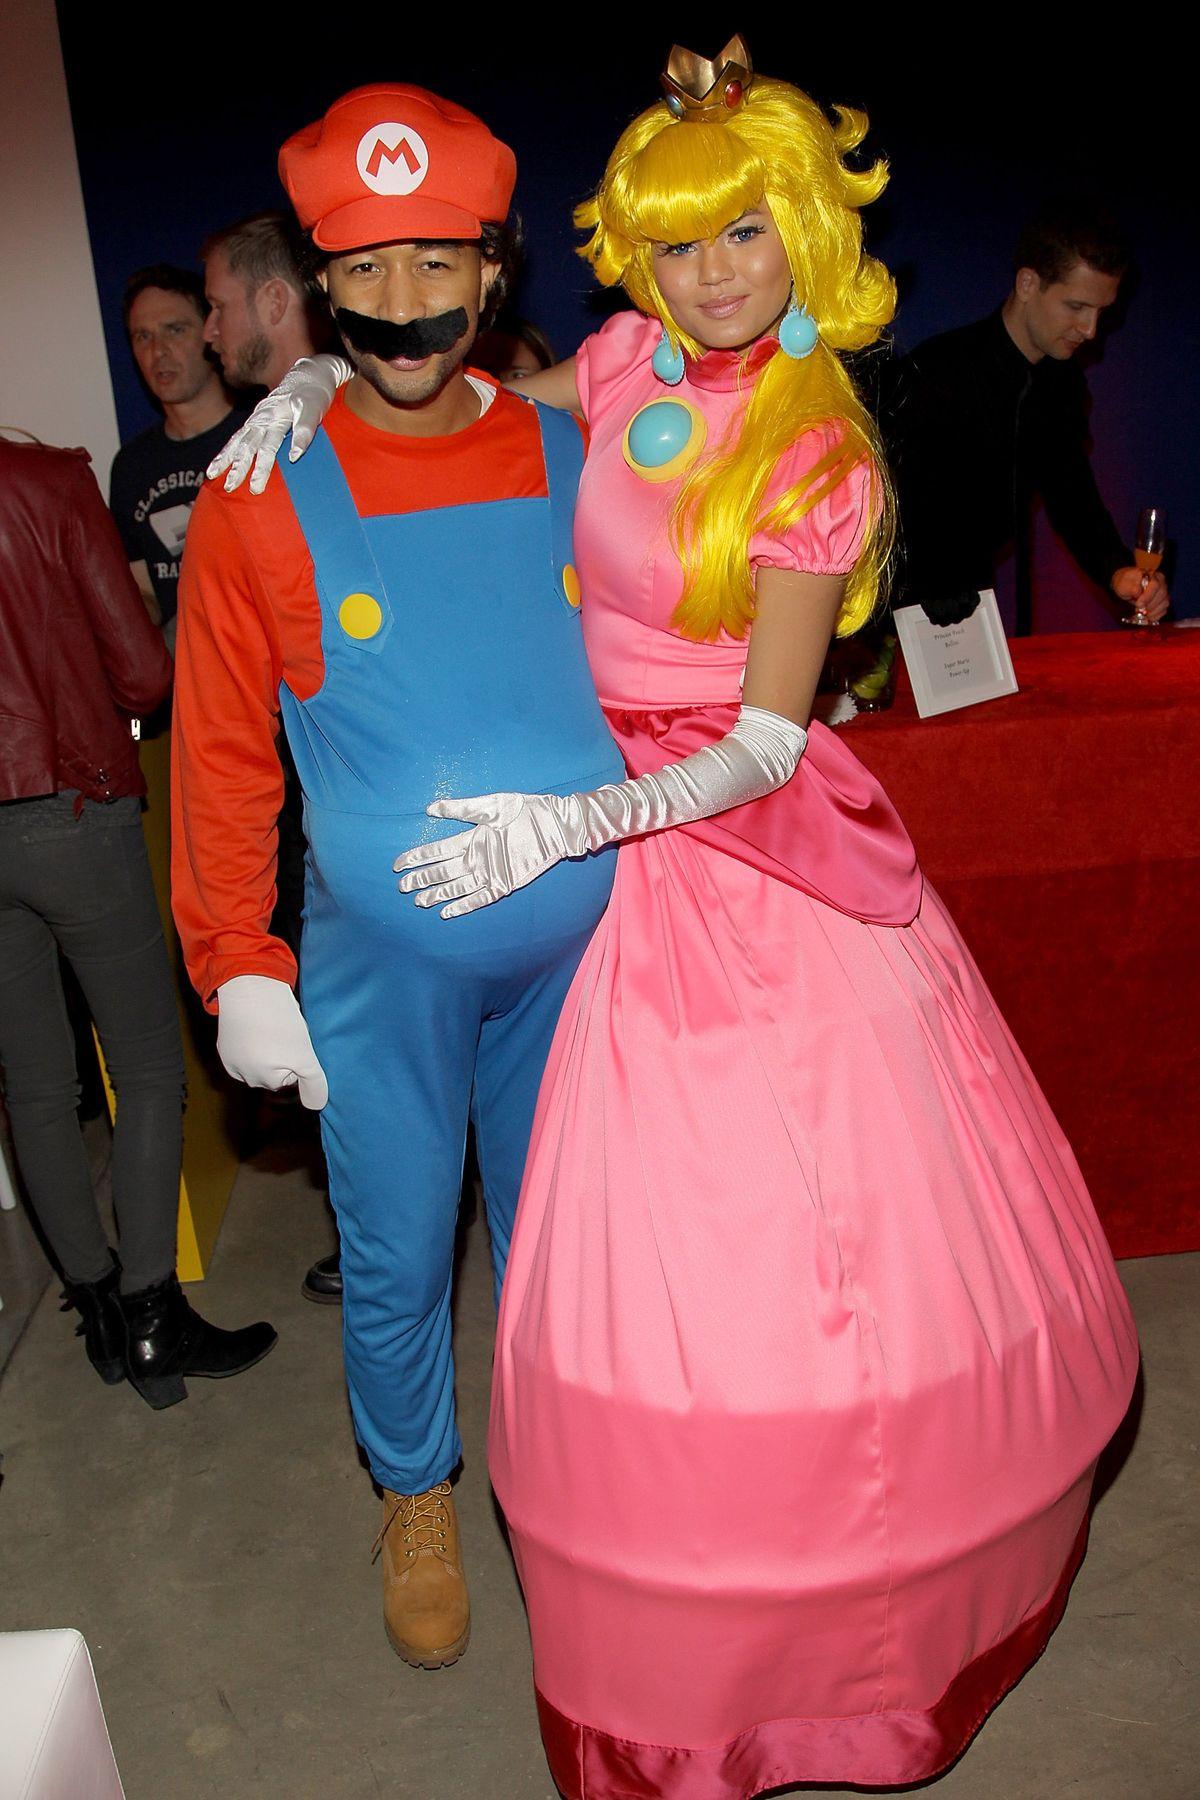 Parejas de celebridades disfrazadas para Halloween   Playbuzz